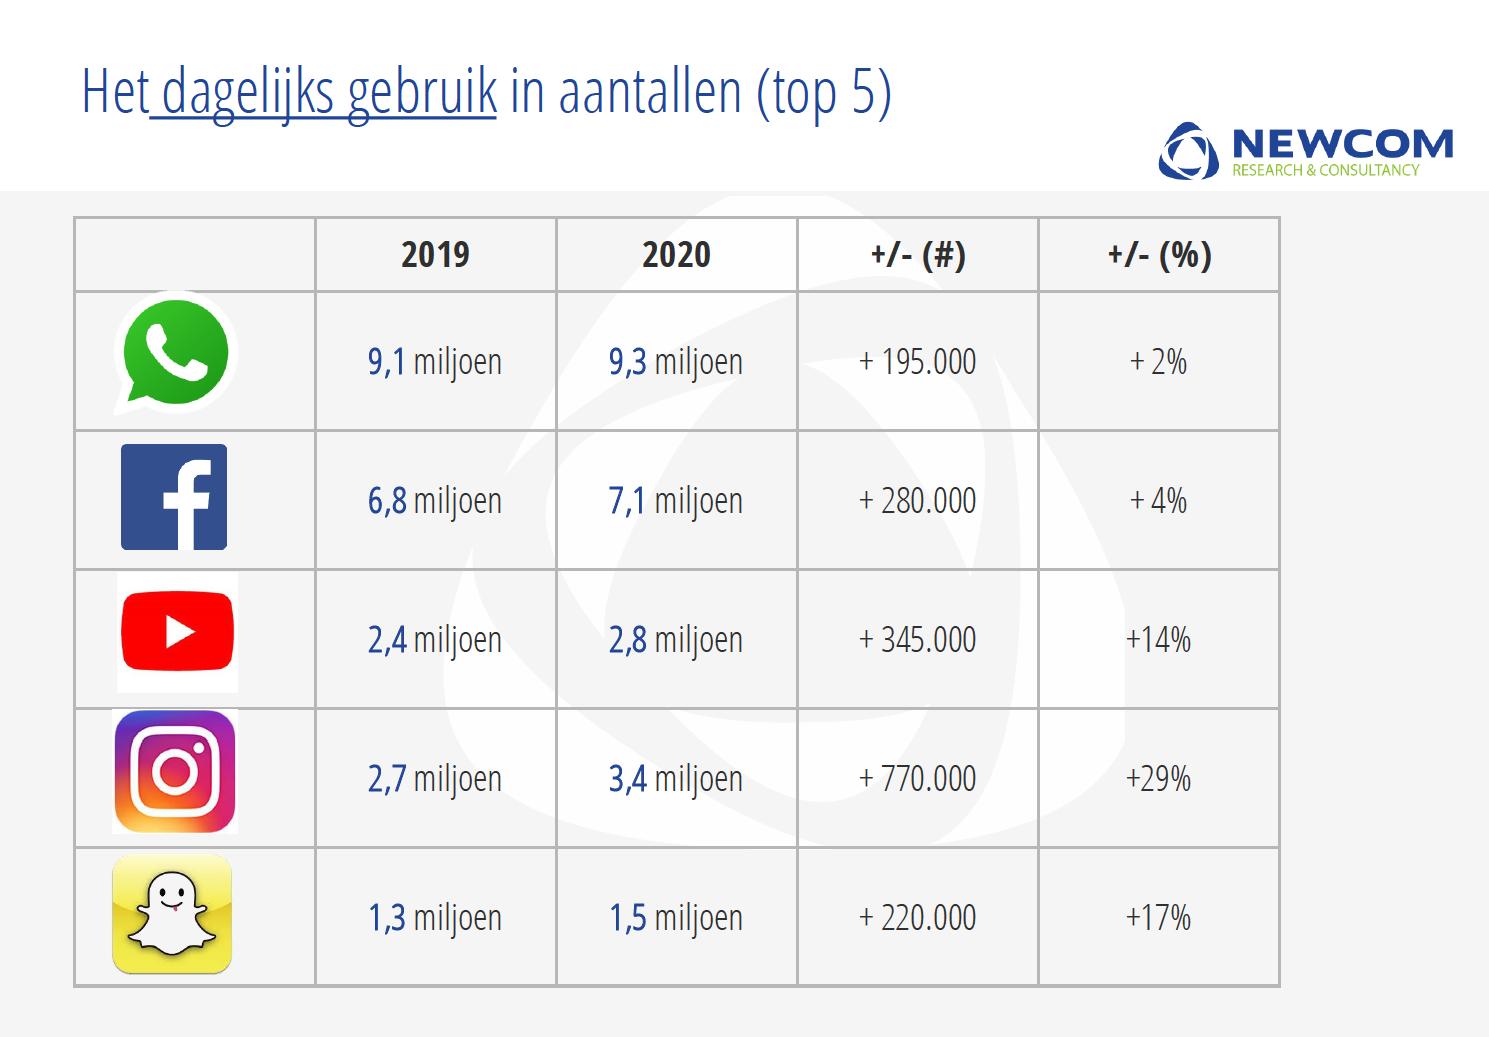 Bron: newcom.nl